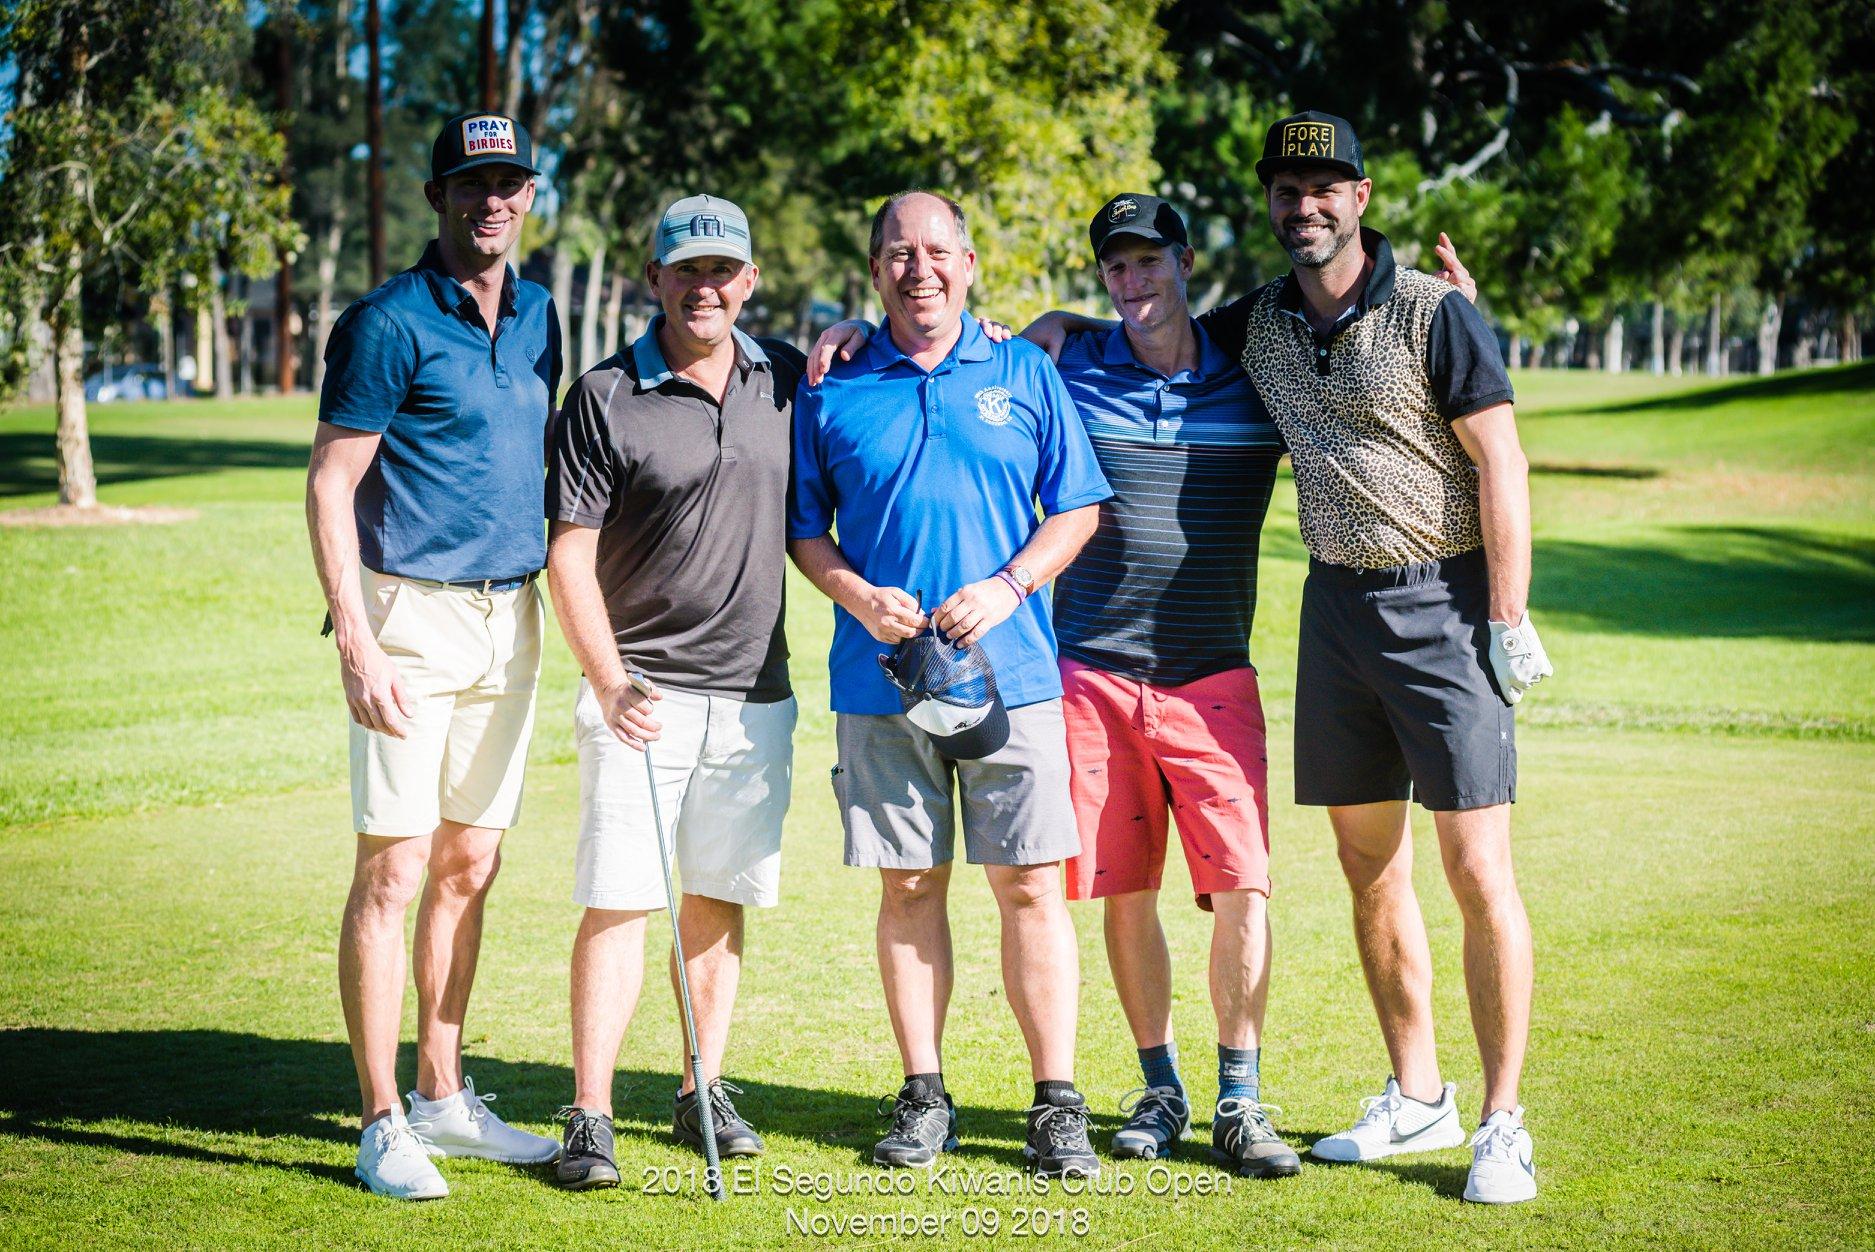 Golf 4 some Kiwanis Cup 2018.jpg